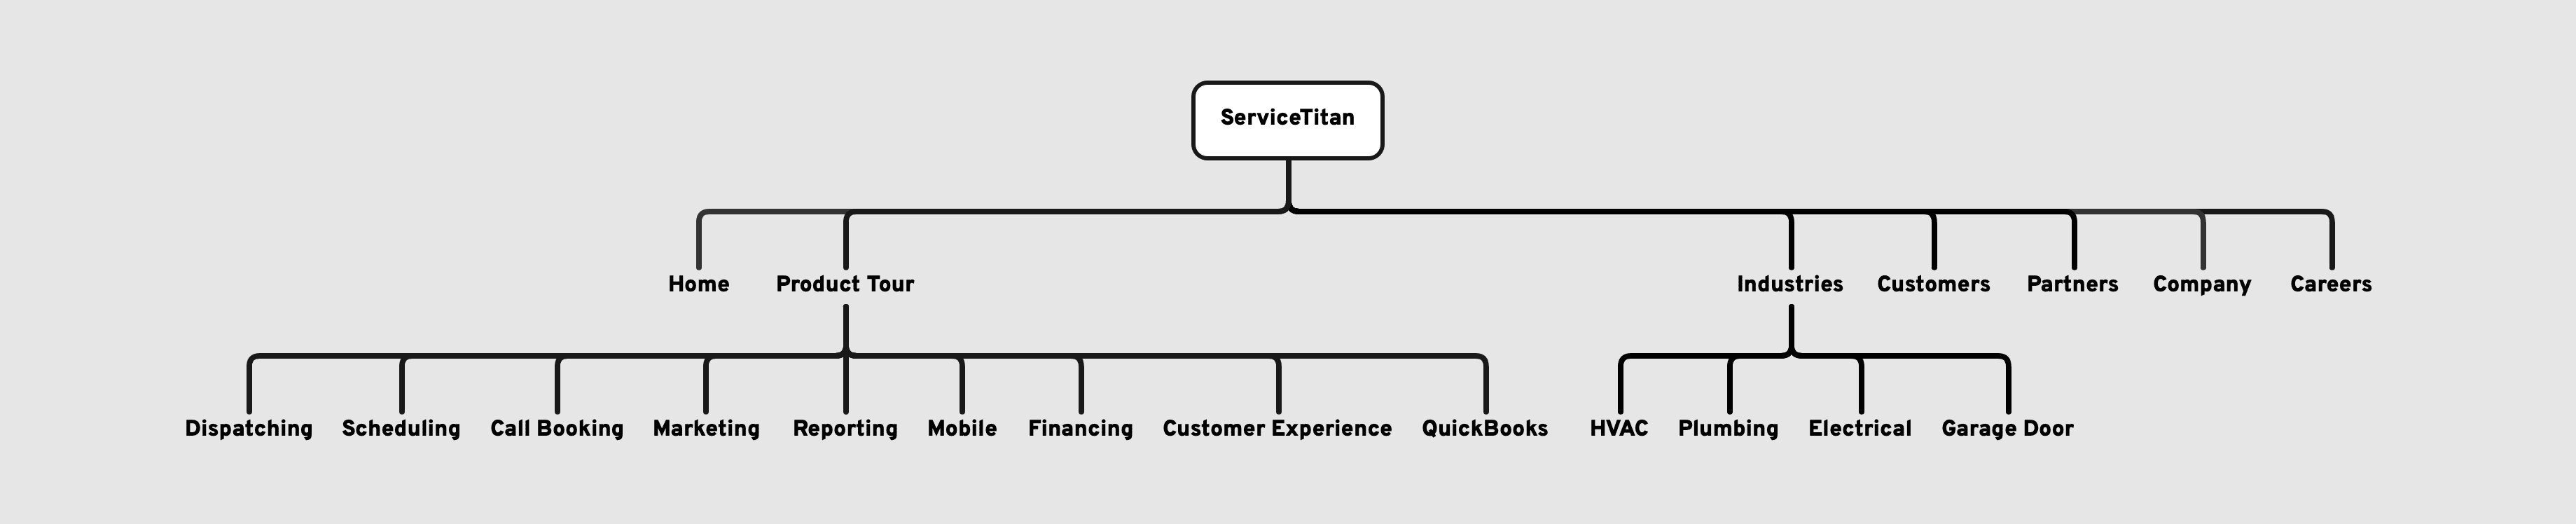 New ServiceTitan sitemap.